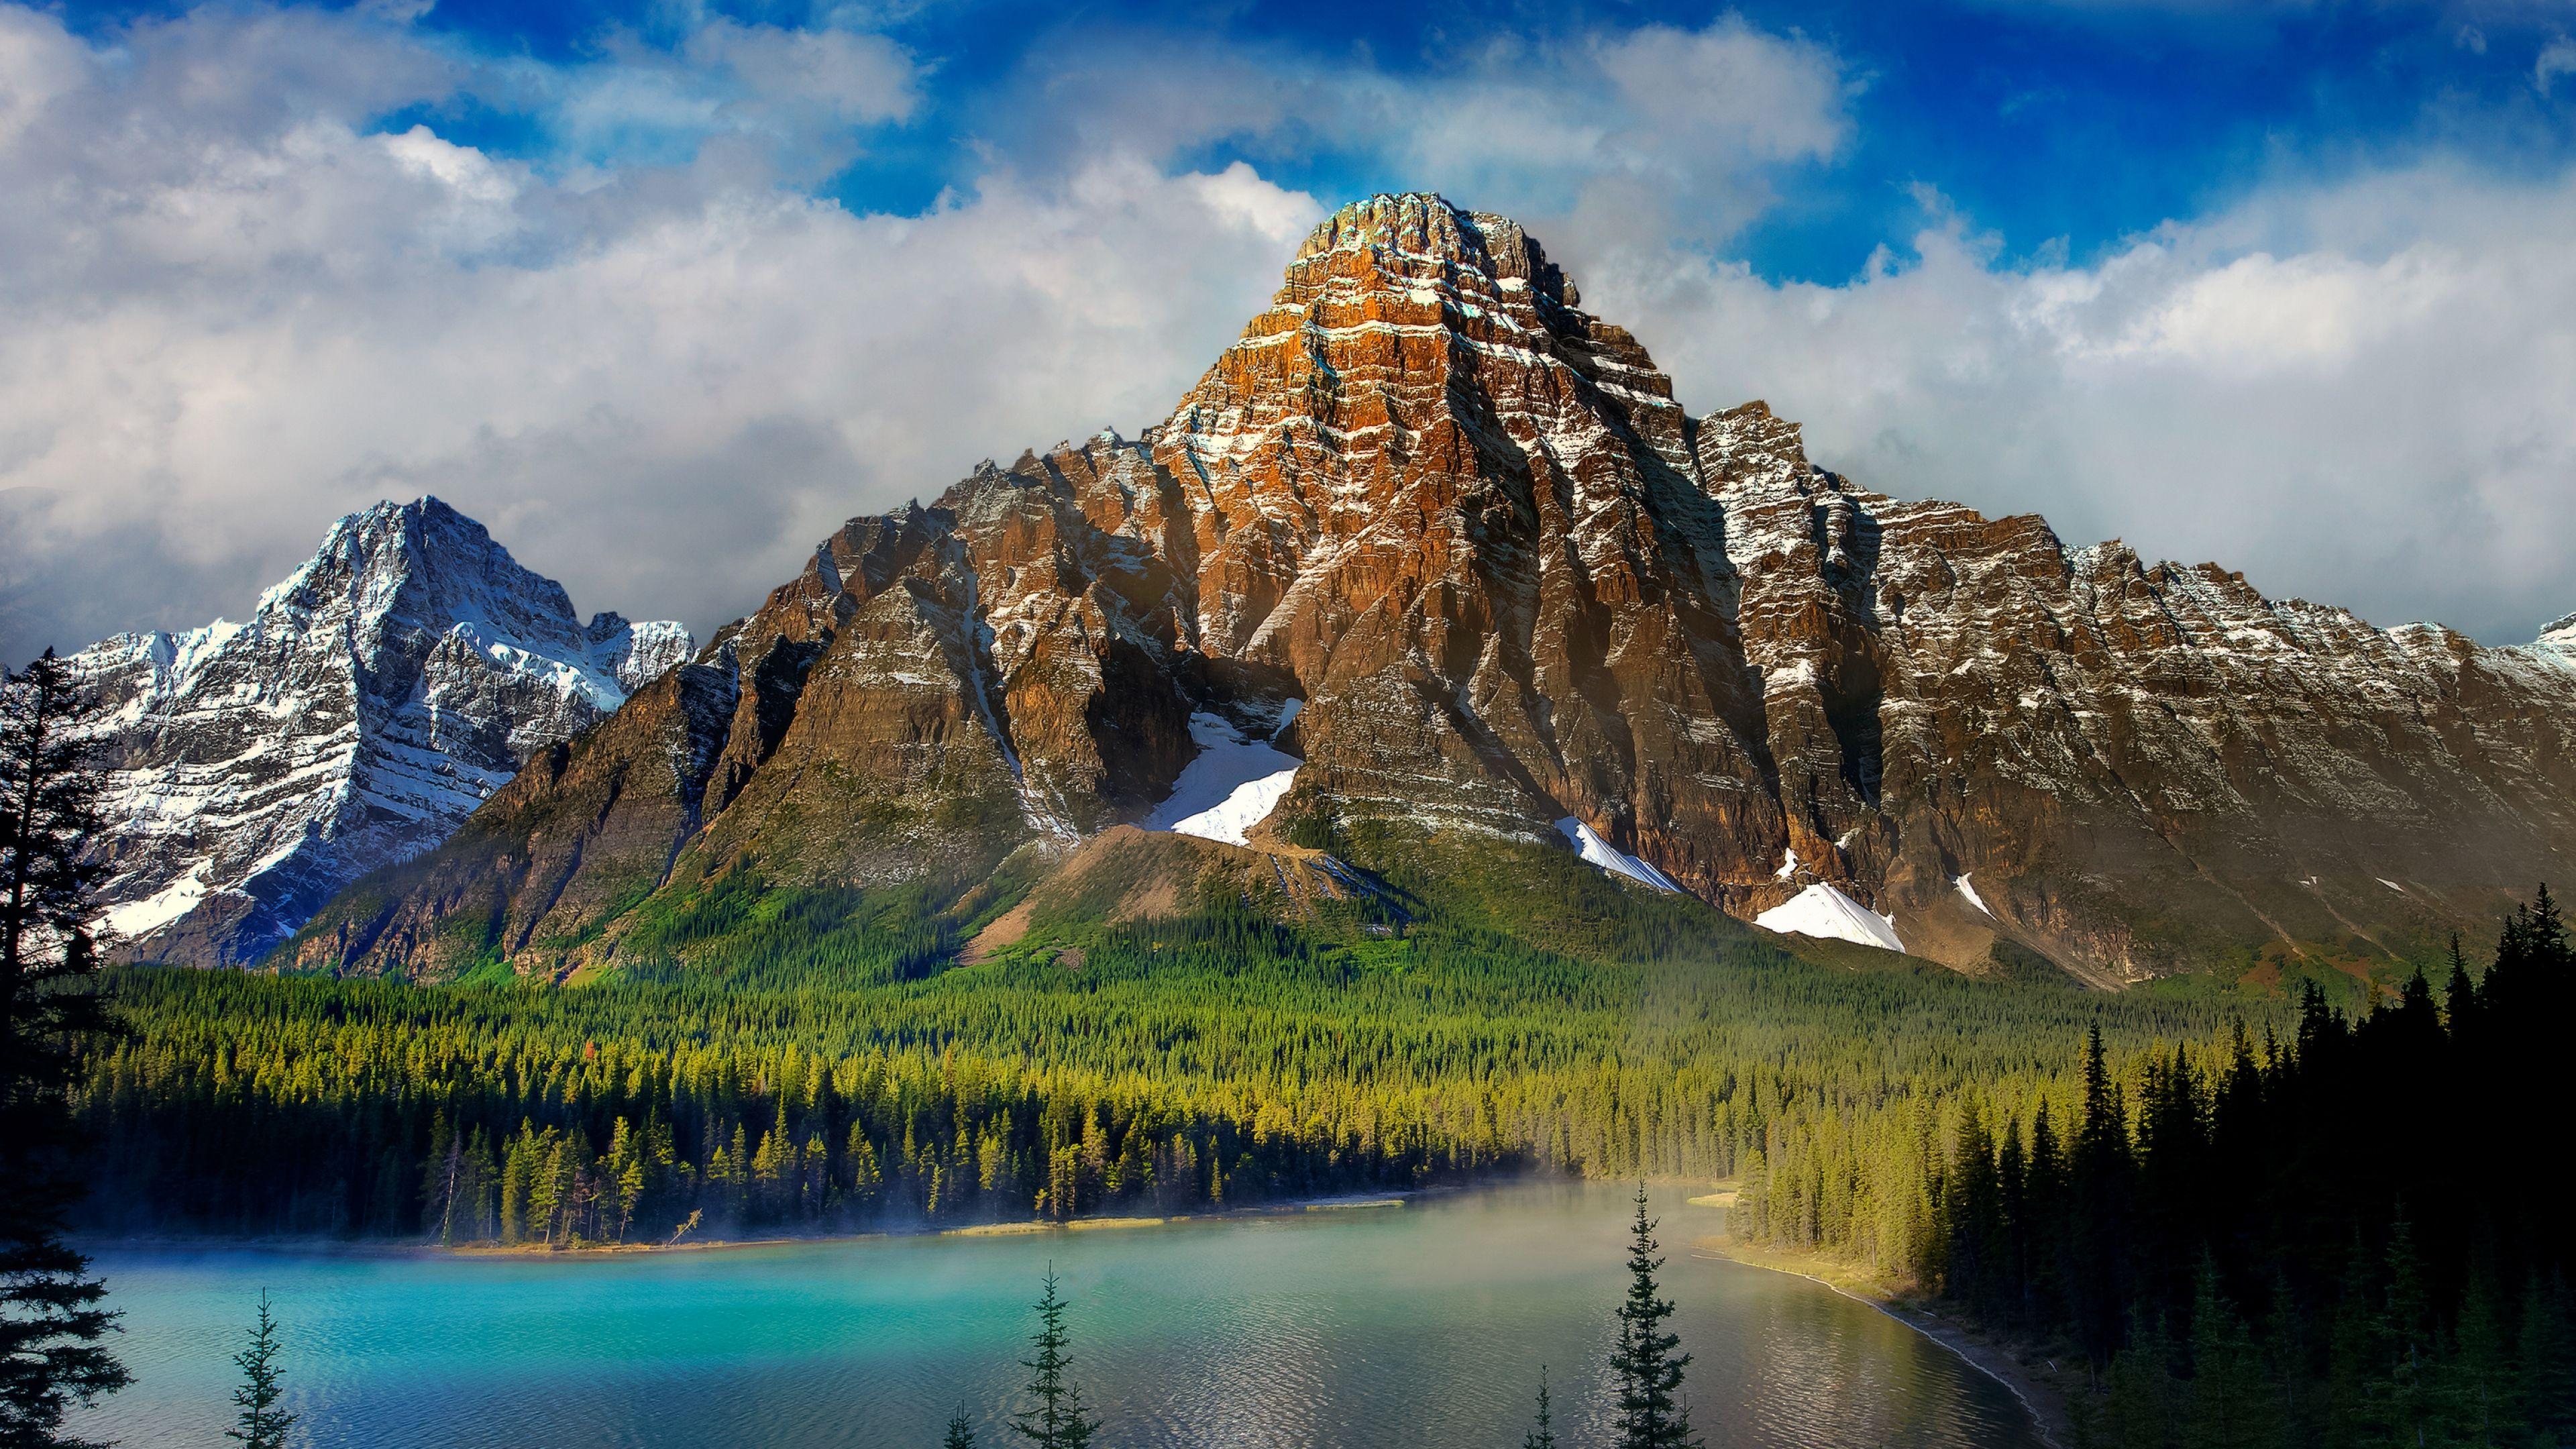 Lake Mountain Scenery Wallpaper HD Of Beautiful Landscape